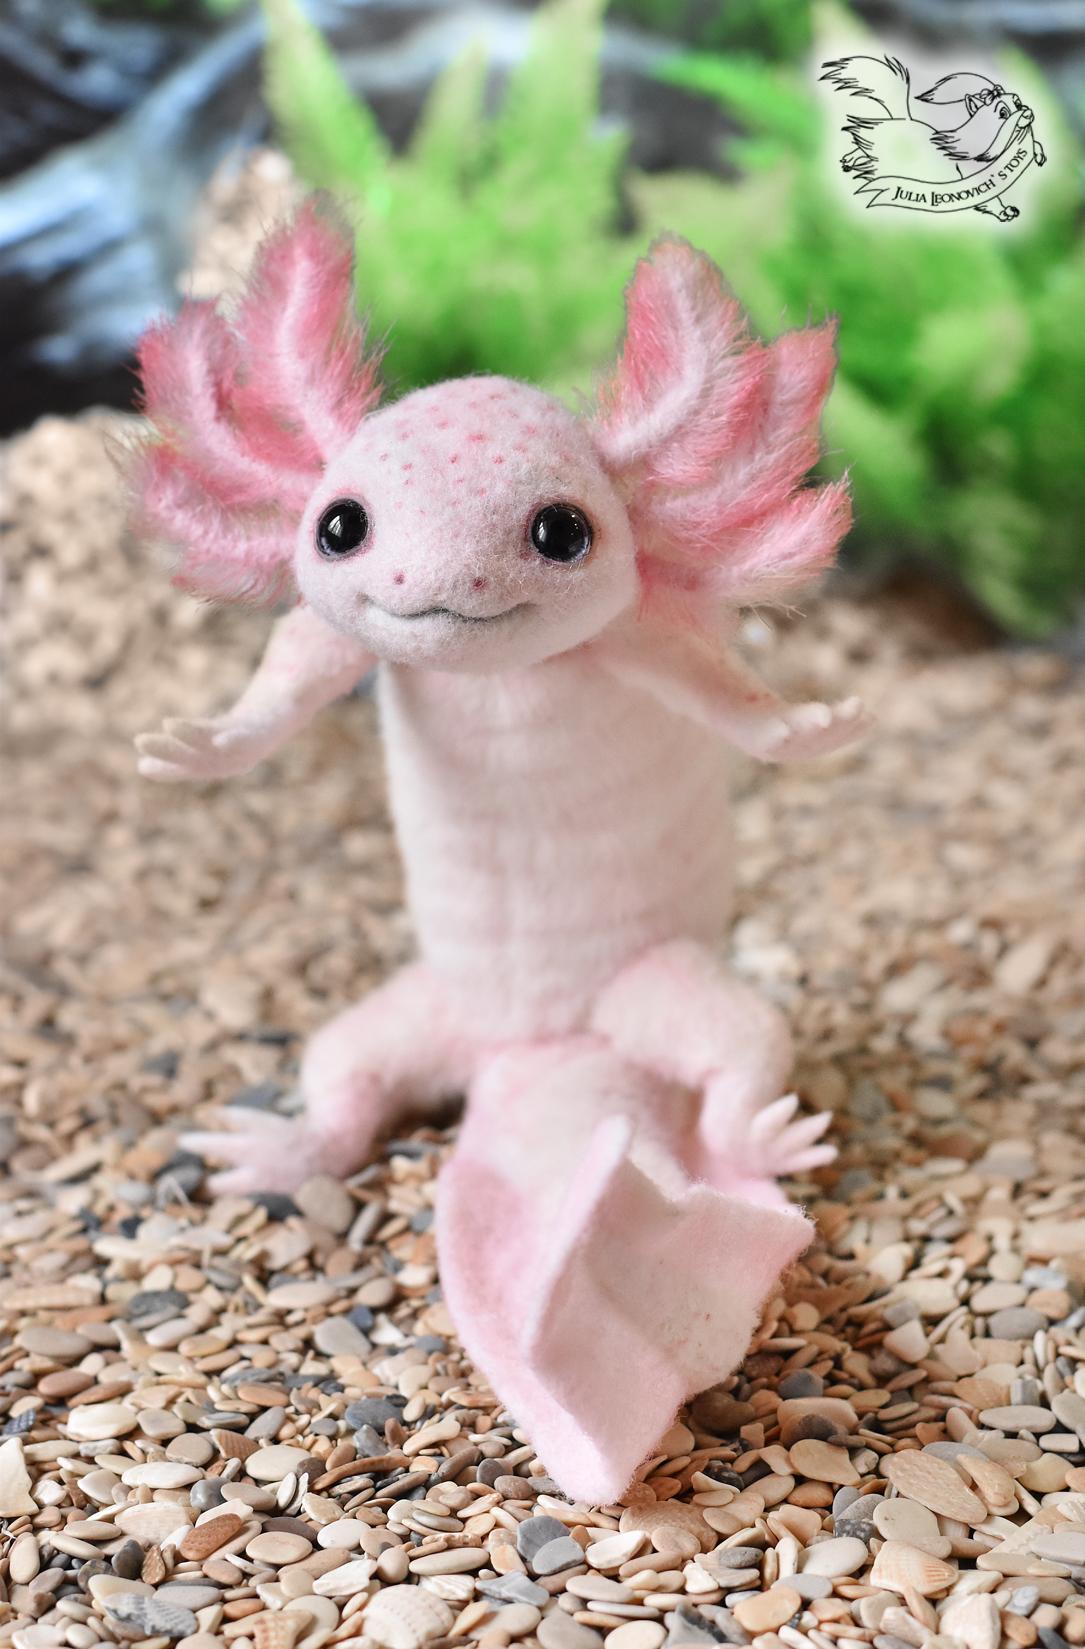 Axolotl Toy (Is Back)